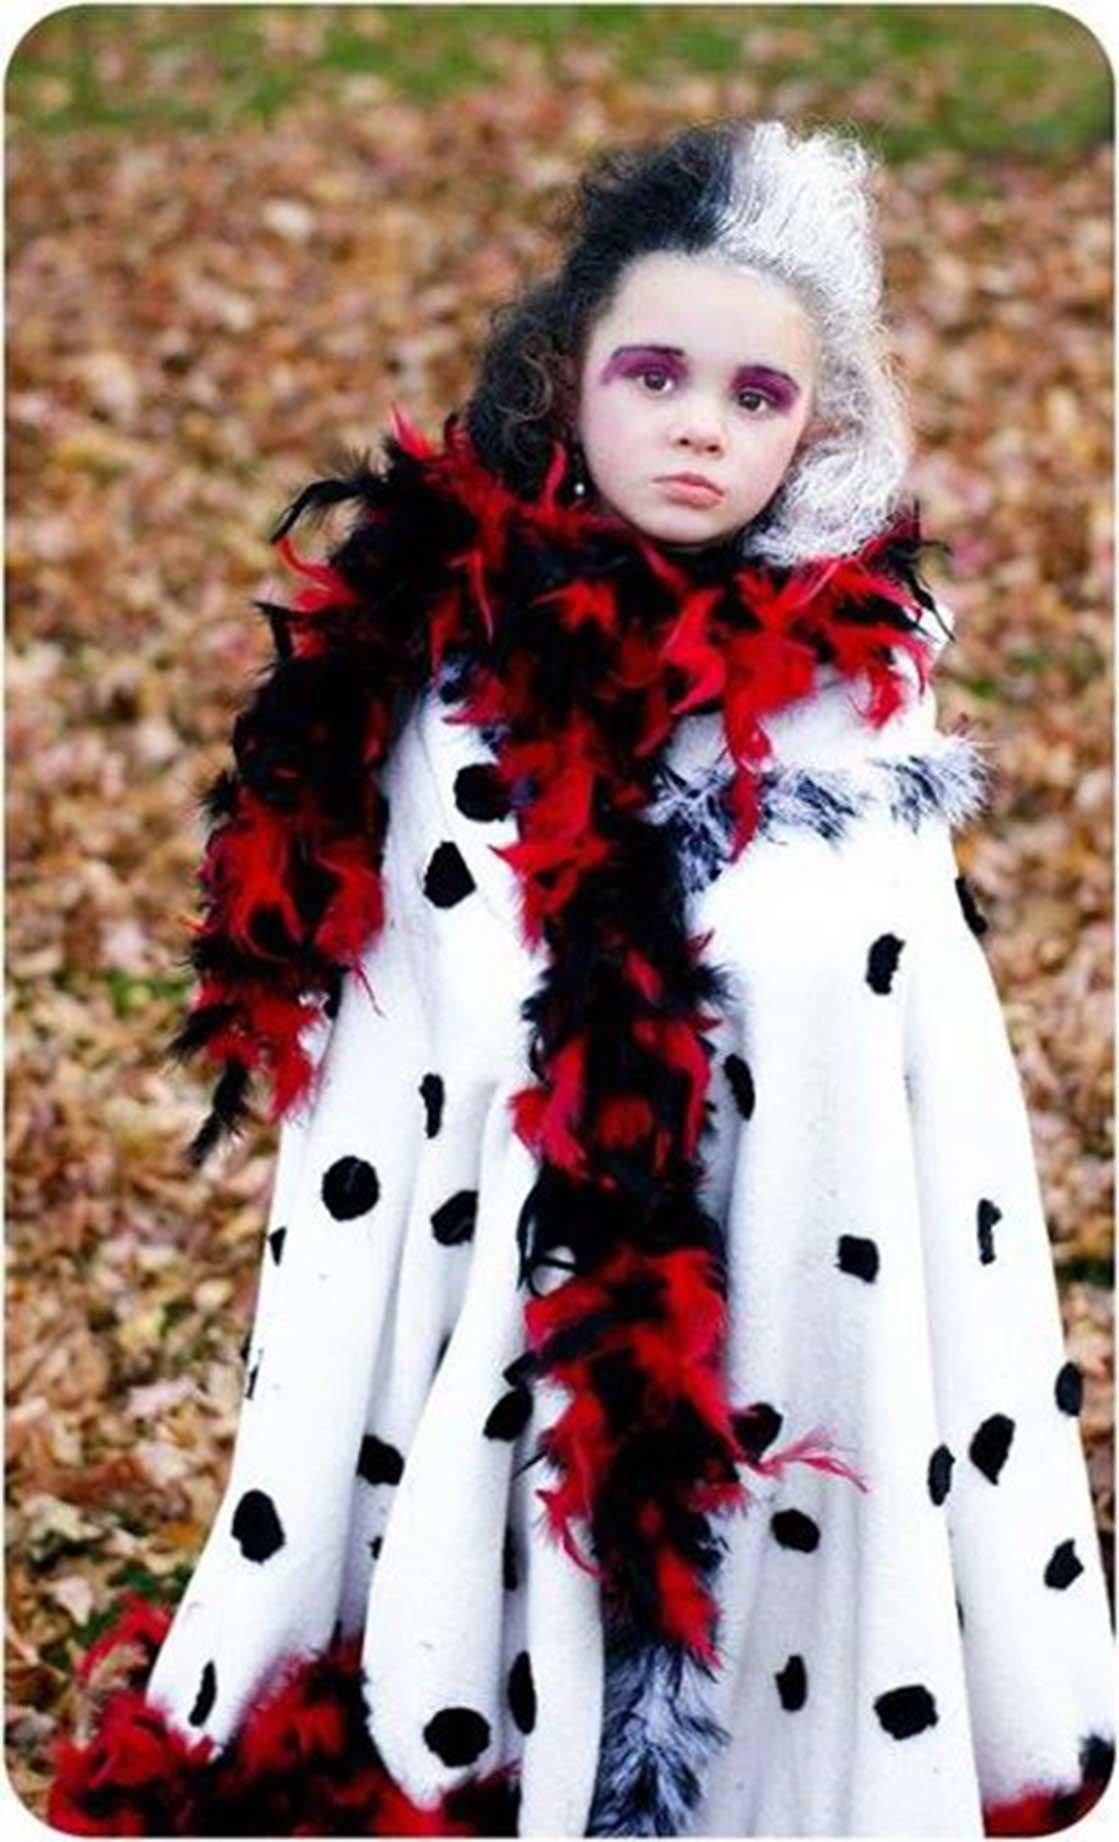 sc 1 st  HuffPost & 57 Fierce Halloween Costumes For Girls Who Rock   HuffPost